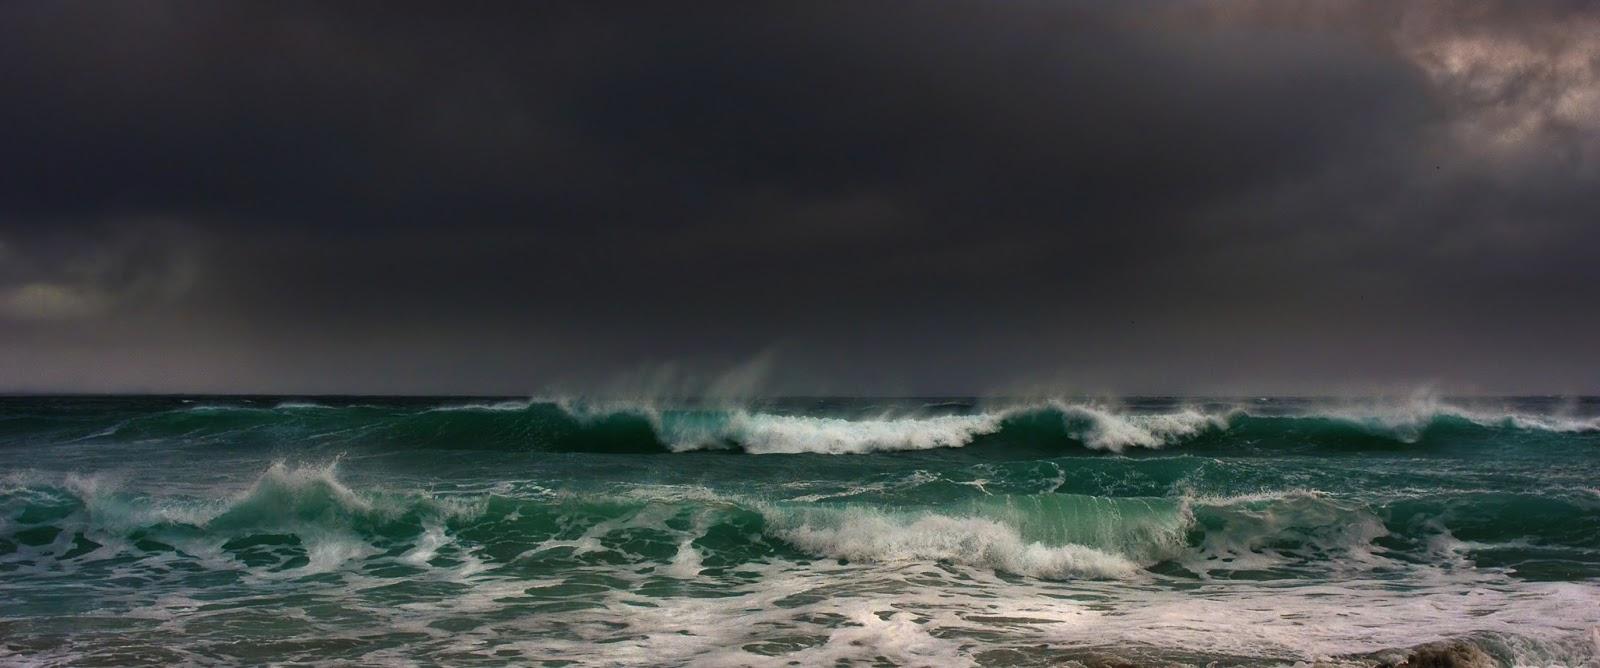 http://2.bp.blogspot.com/-XpP9yqyW0RQ/UPRjl4ApySI/AAAAAAAAAR8/5PgL8GnEG14/s1600/stormy+weather.jpg